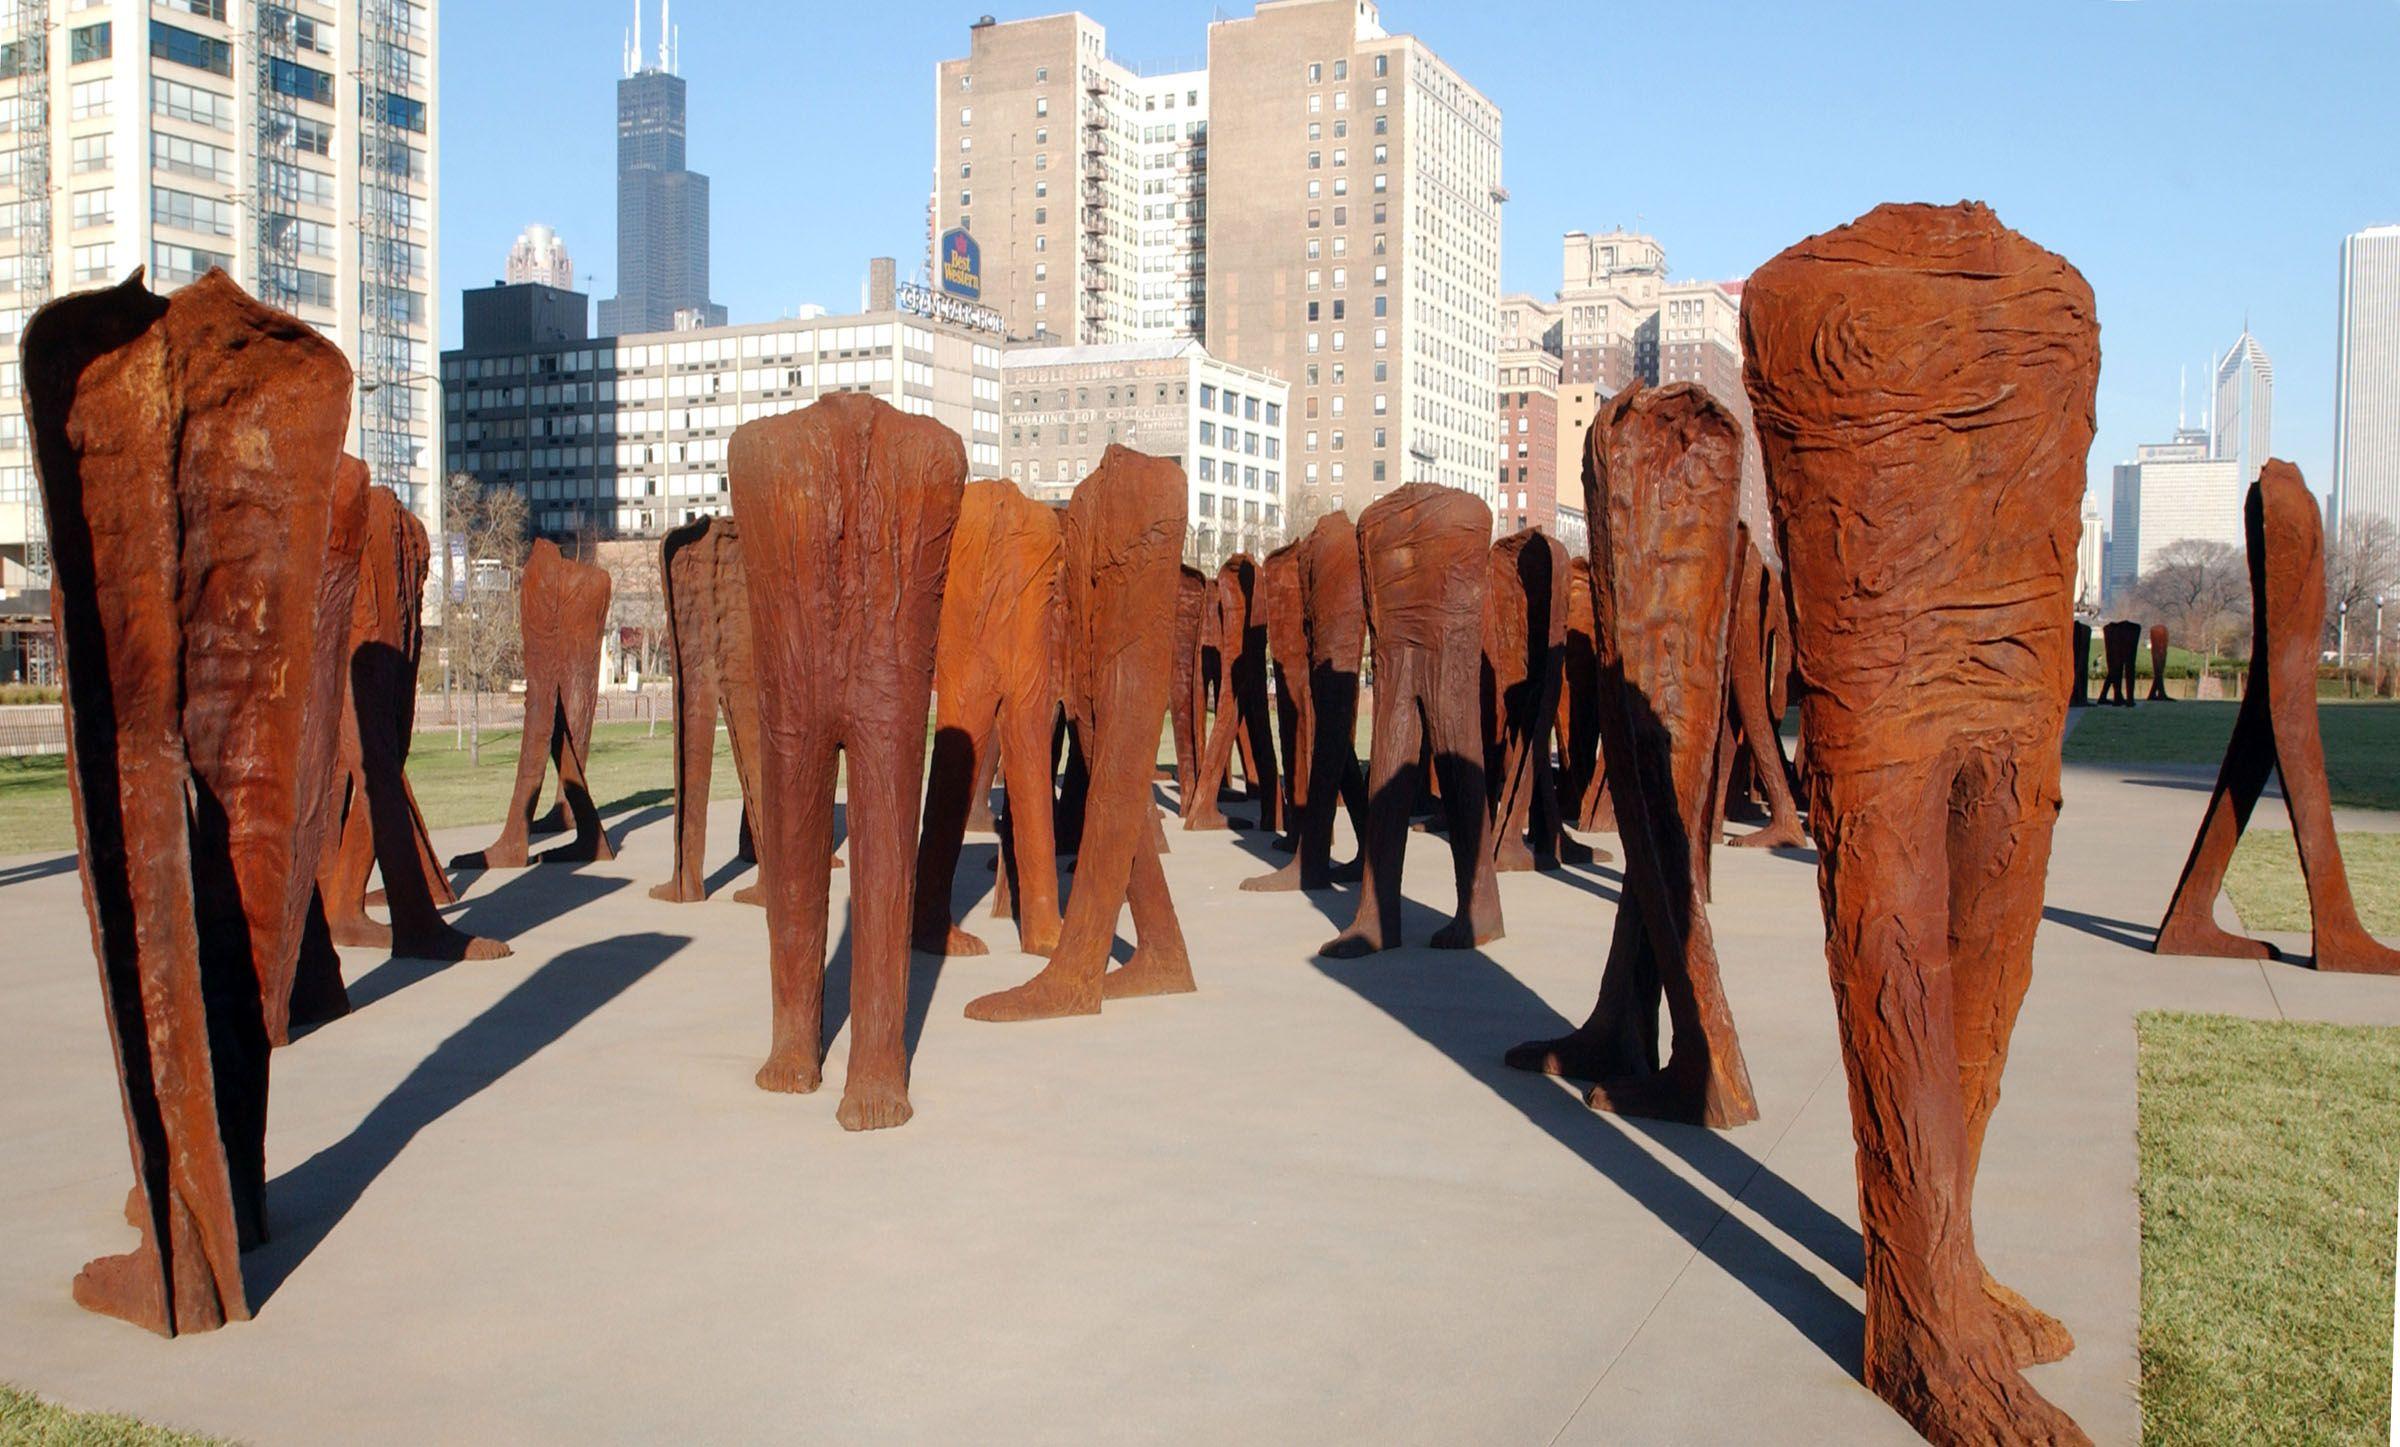 Comprised Of 106 Nine-foot-tall Headless Torsos Agora